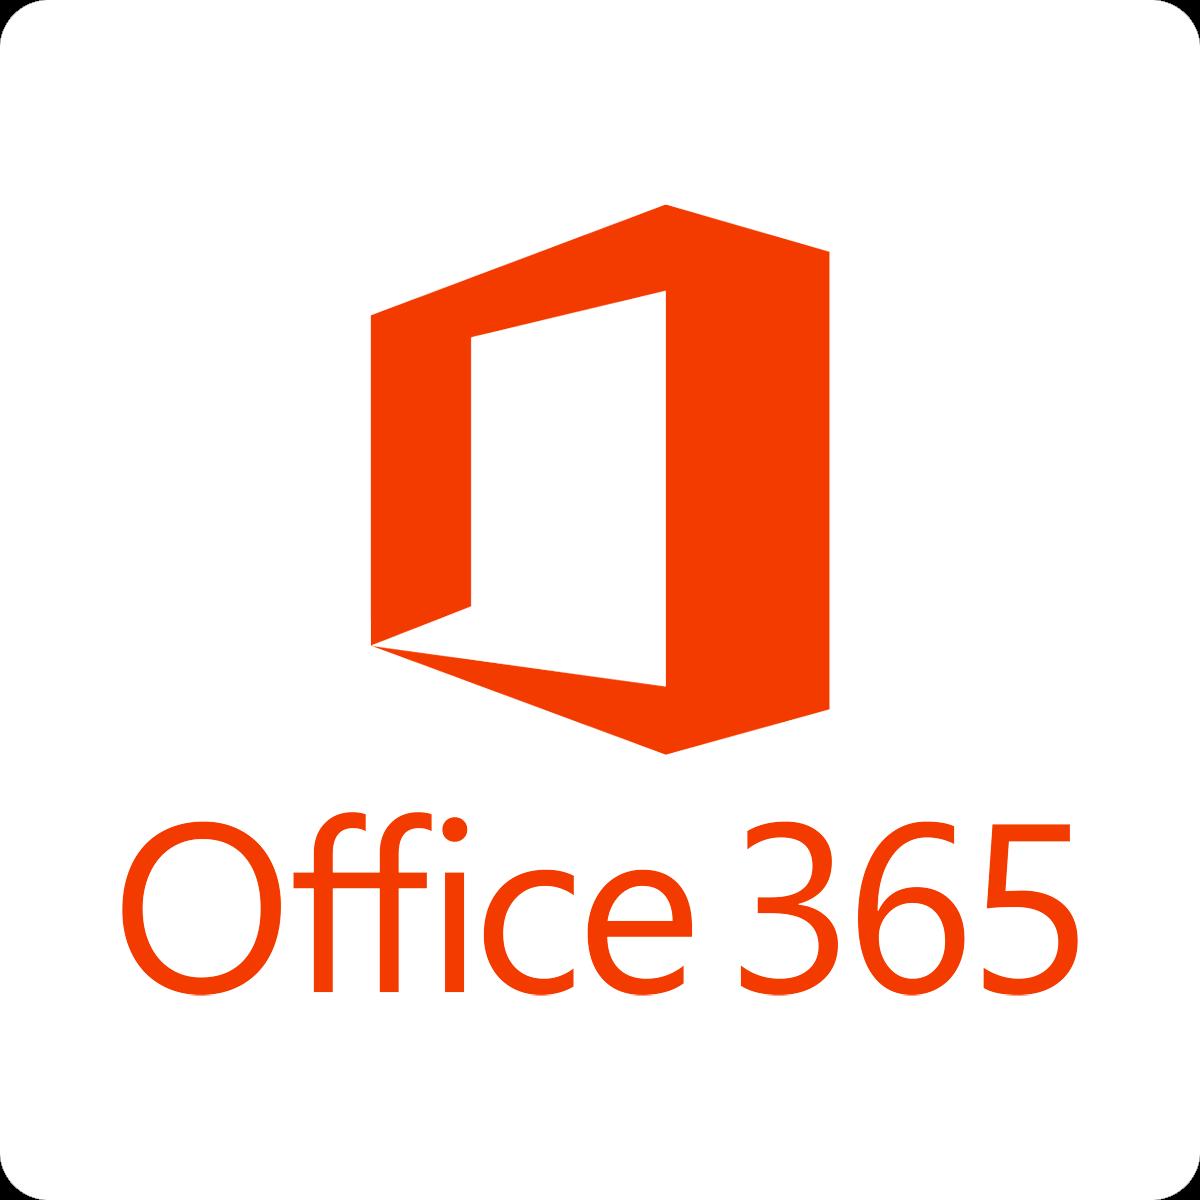 Microsoft Office 365 Crack [Win + Mac] Updated Key 2020 [100% Working]